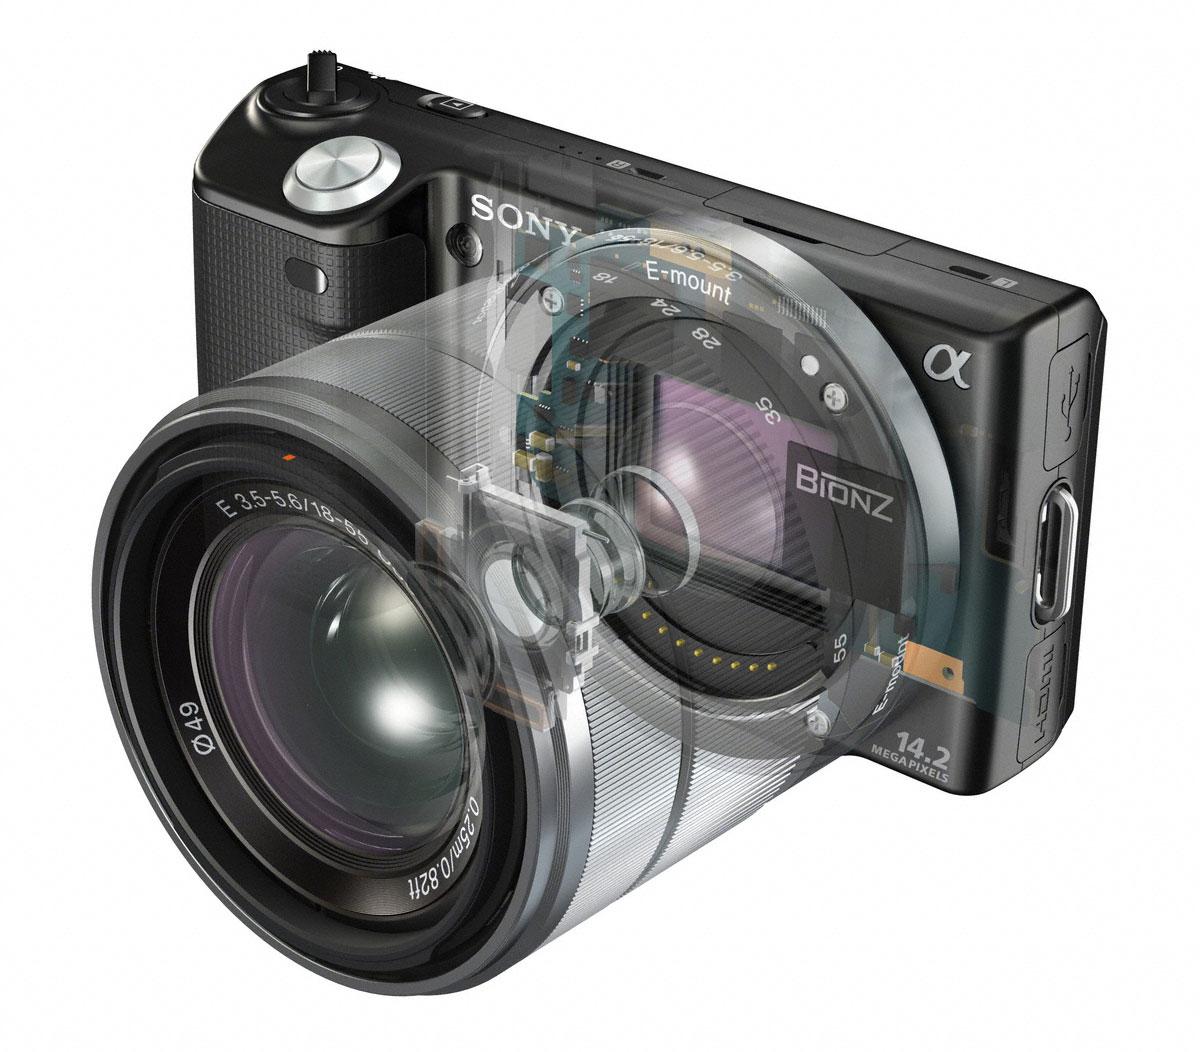 Sony NEX-3 / NEX-5 Review: Digital Photography Review